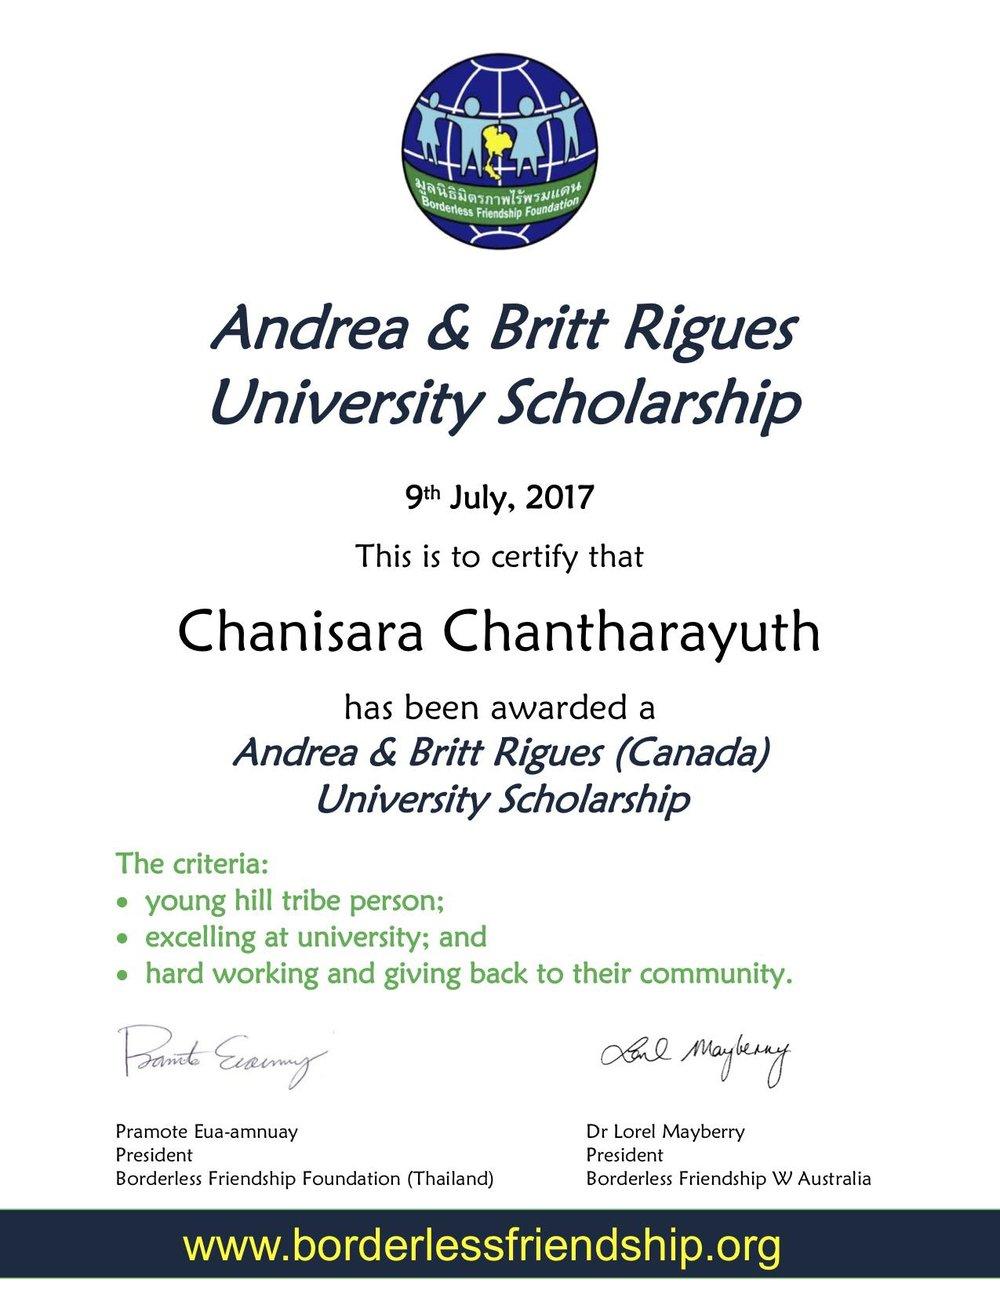 Andrea & Britt Rigues University Scholarship - Chanisara Chantharayuth.jpg